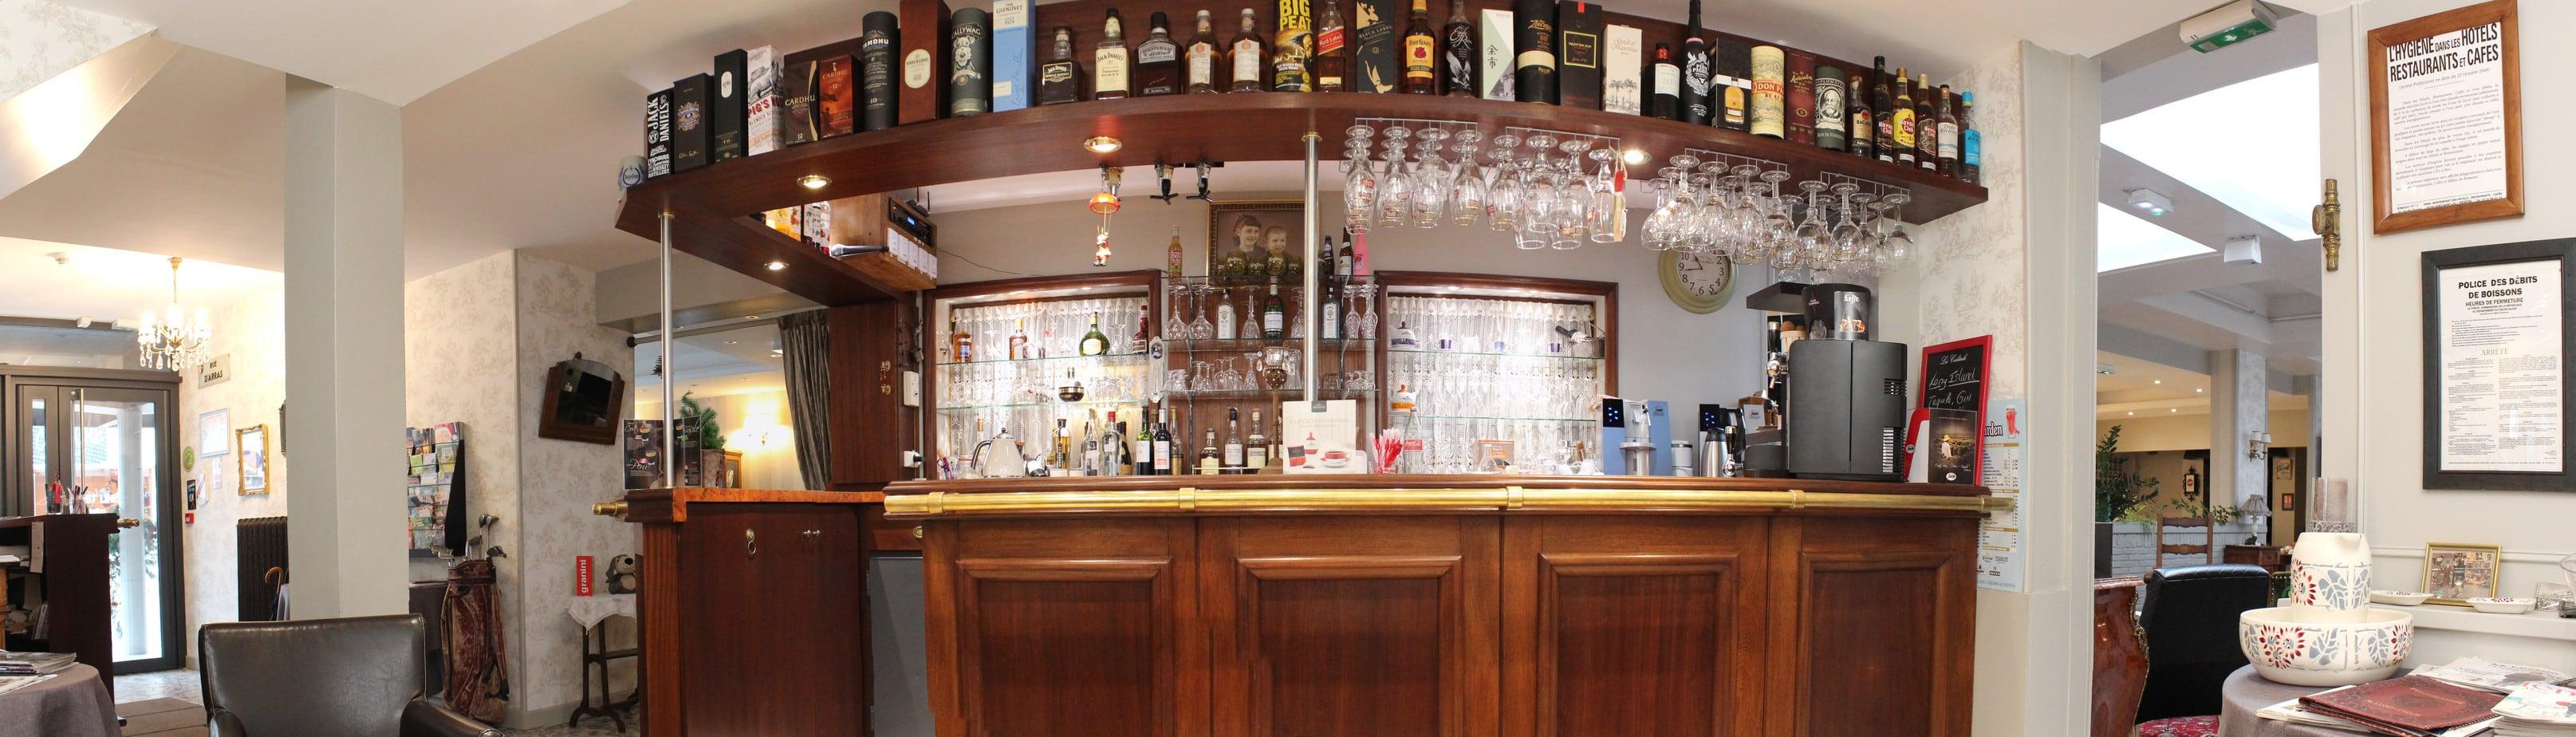 Le bar de l'hypnos hotel à hesdin.